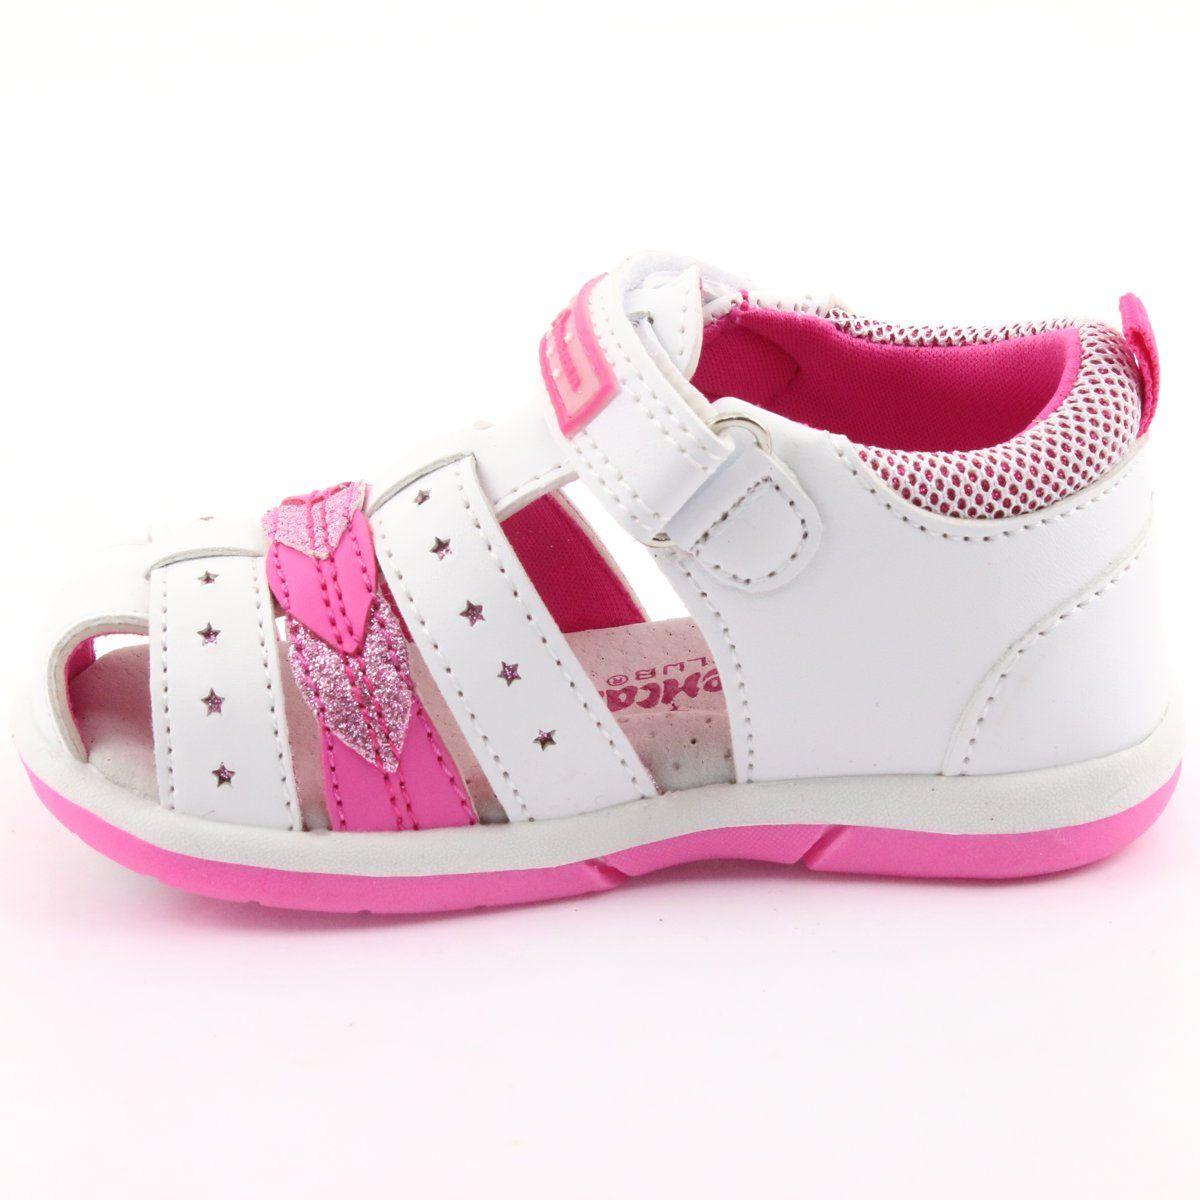 American Club Sandalki Dziewczece American Dr18 Biale Rozowe Baby Shoes Shoes Sneakers